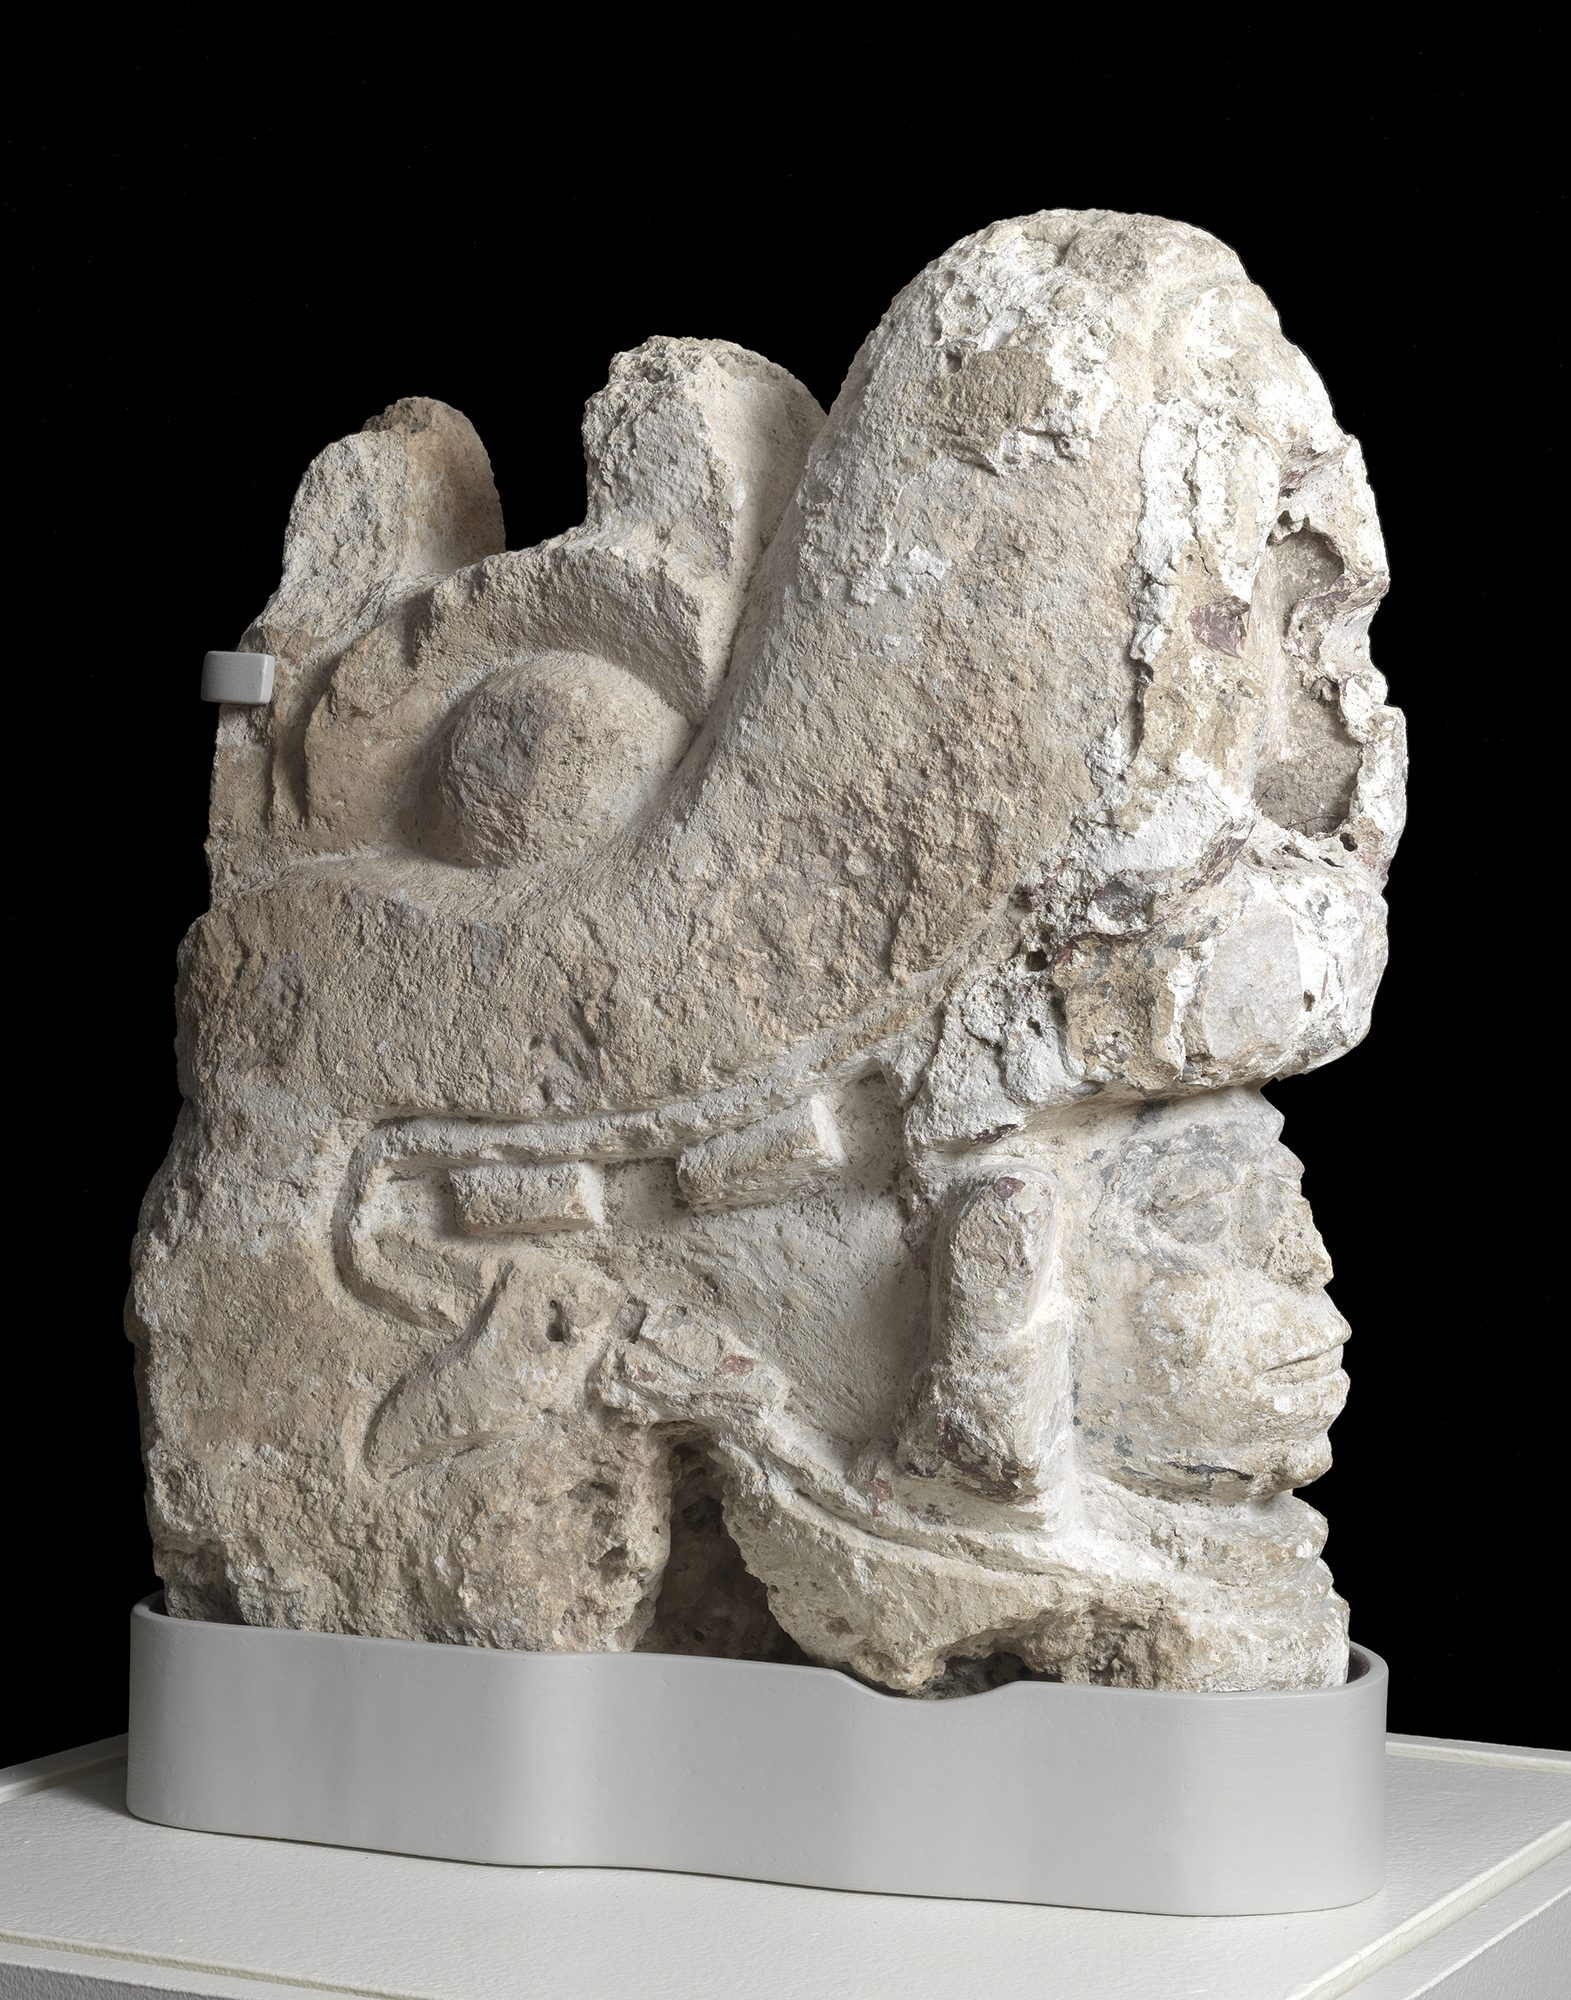 Guardian Spirit from the Northwest Palace of Ashurnasirpal II, ca. 880 BC, gypsum. Gift of Sir Austen Henry Layard through Dwight W. Marsh, Class of 1842. 1851.1